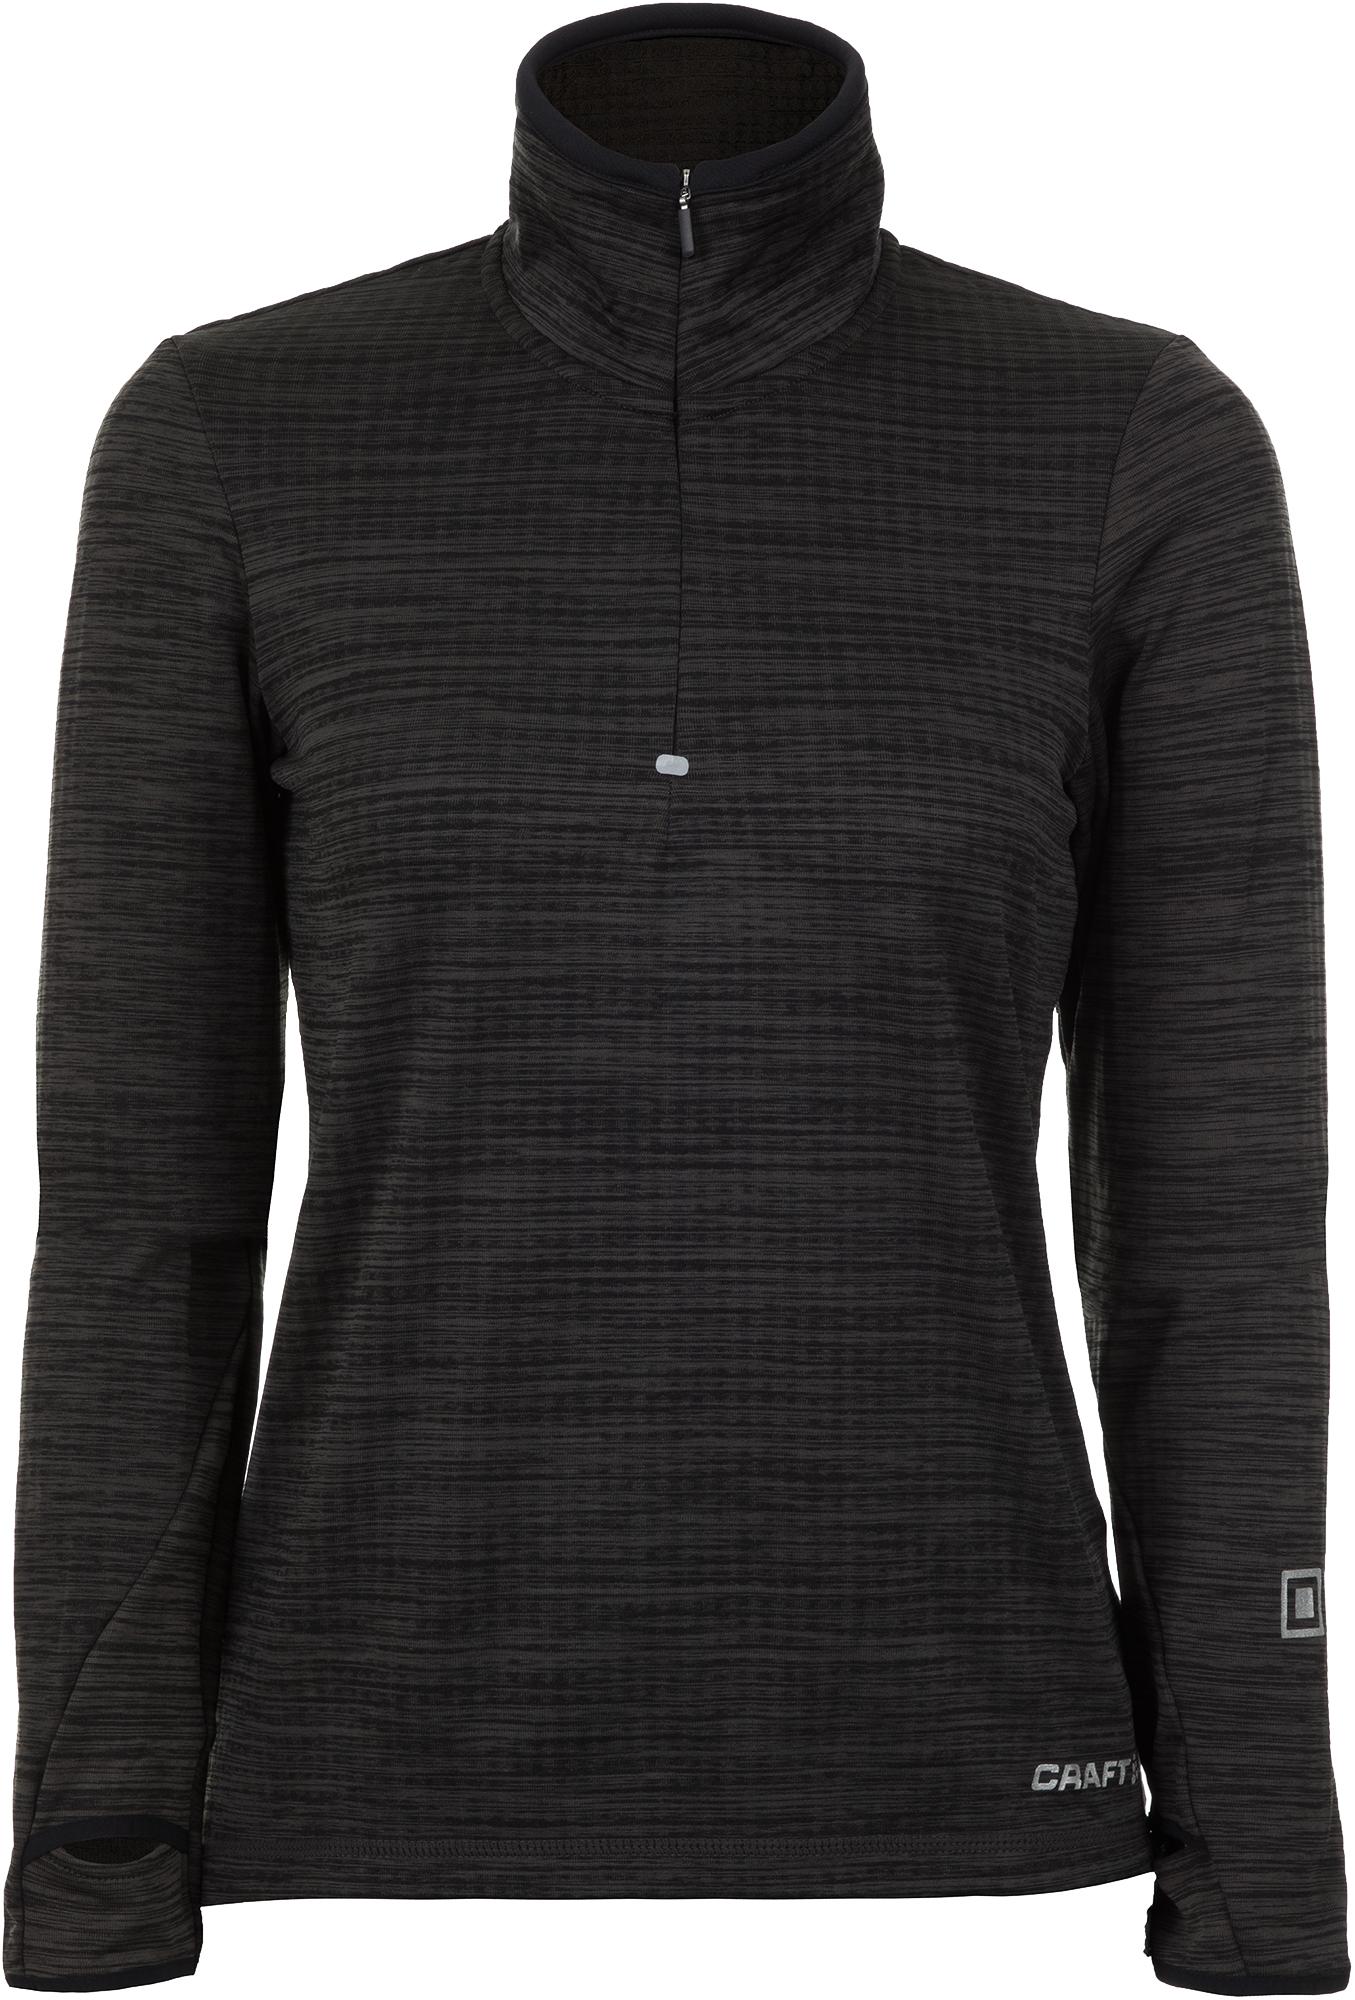 Craft Джемпер женский Grid Halfzip, размер 46-48